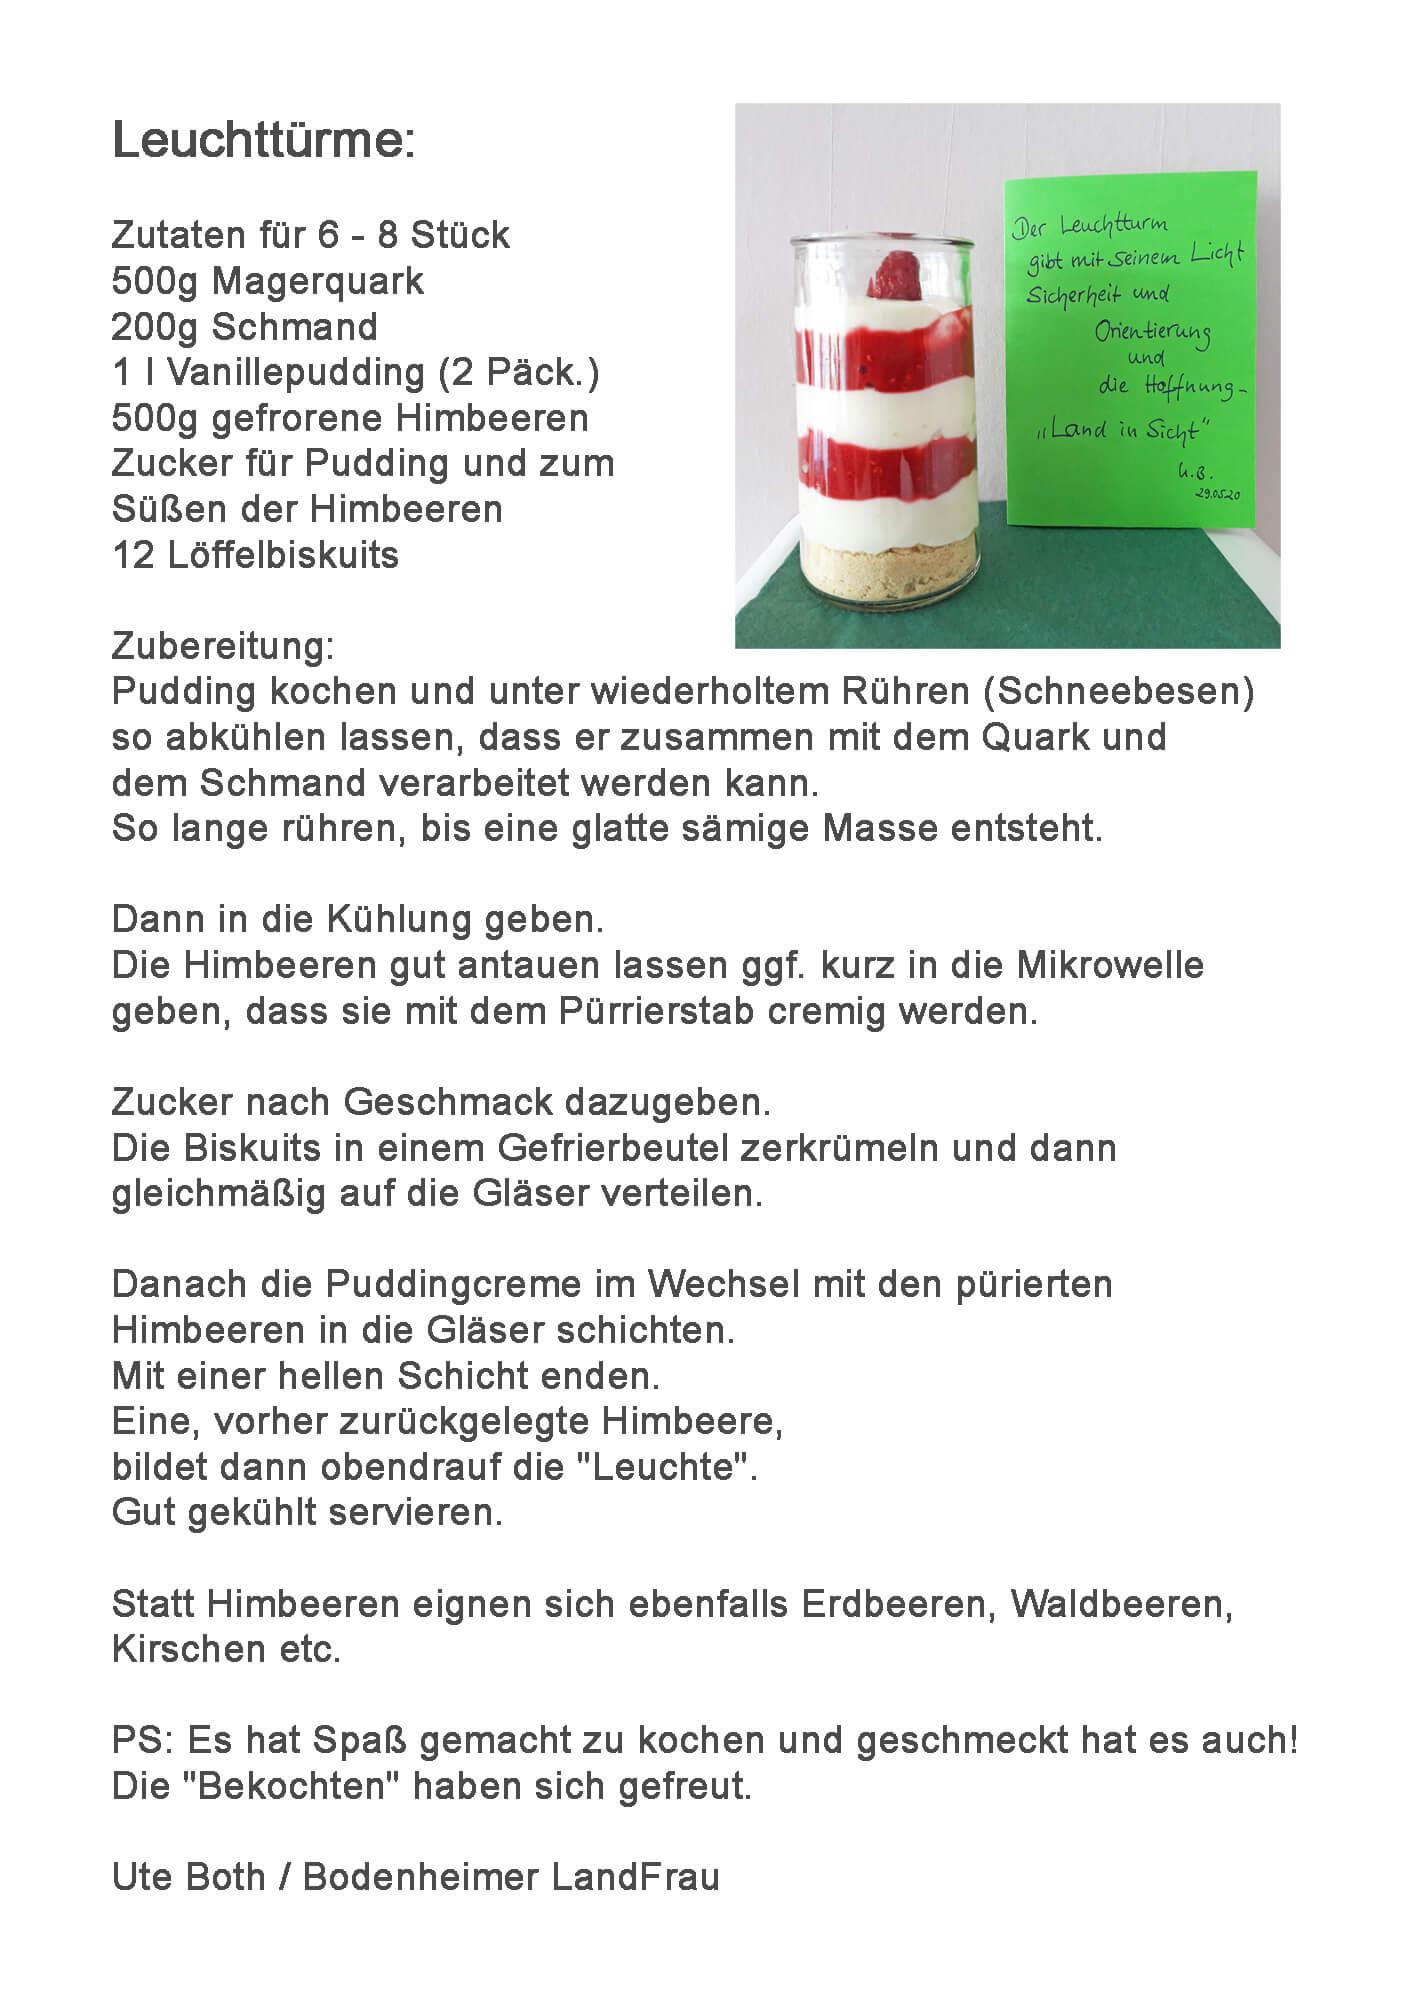 13d_Rezept_Leuchttürme, LandFrau